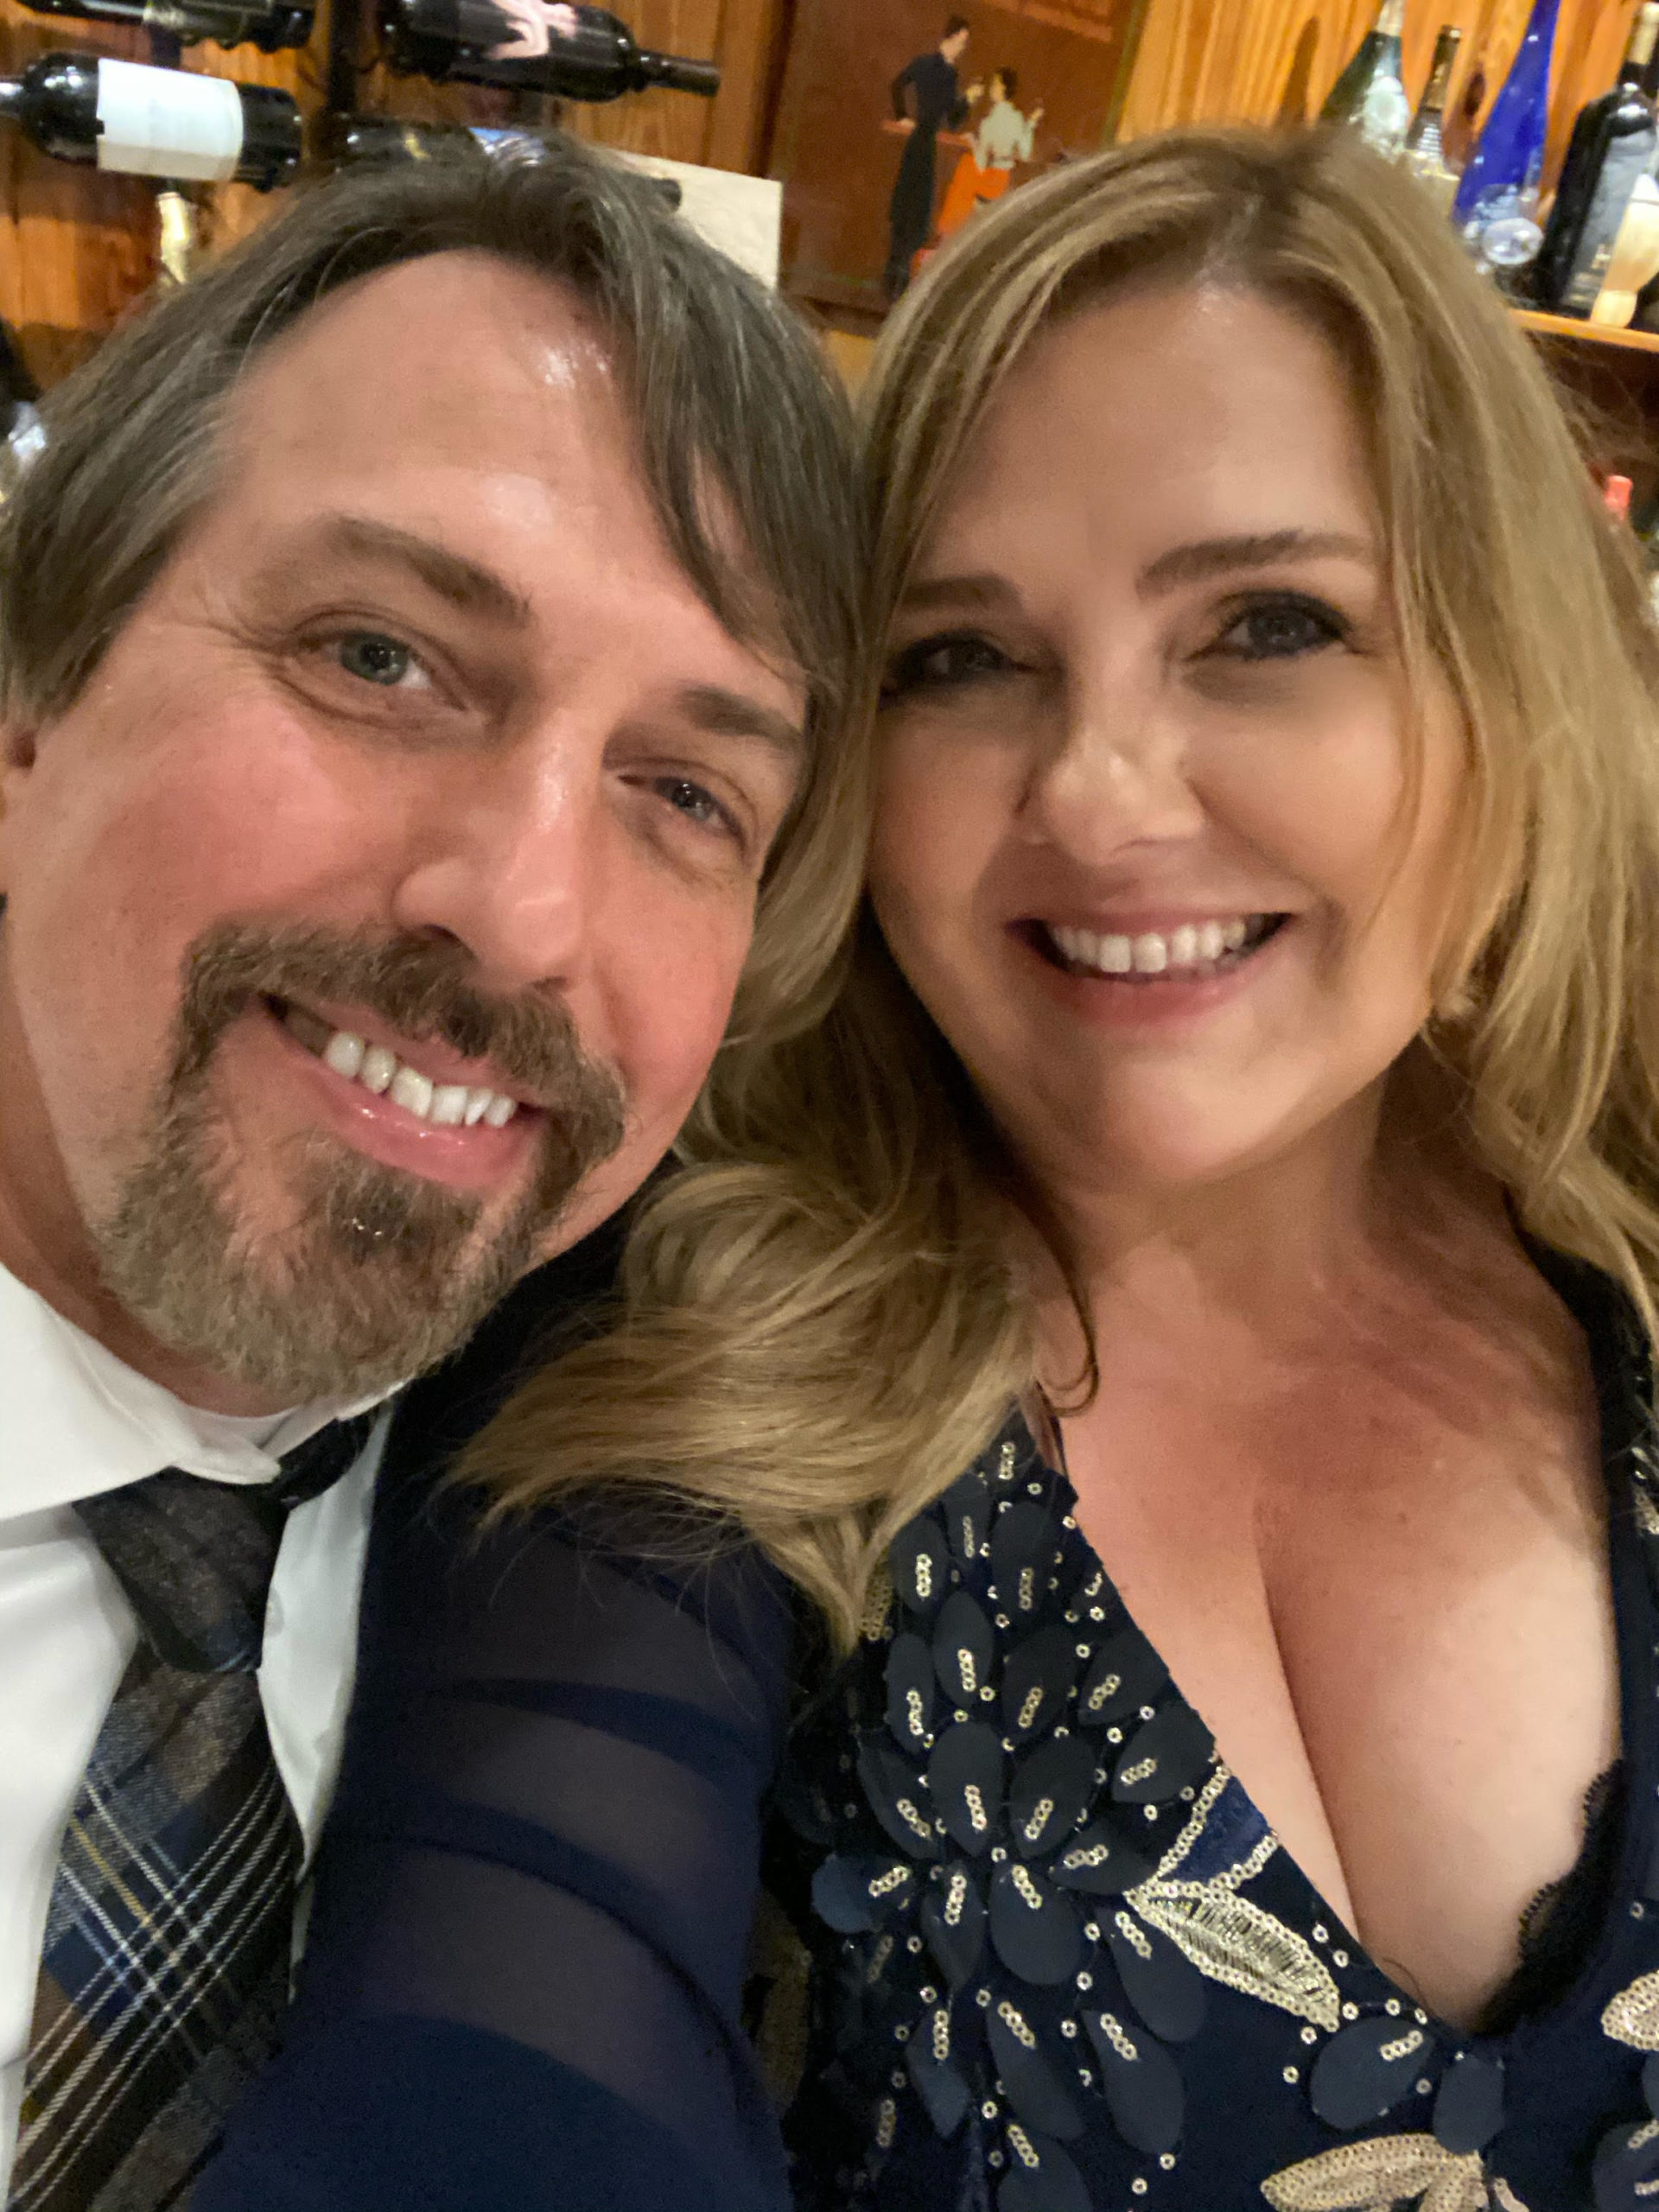 Gary Grant and Talesha Hogan